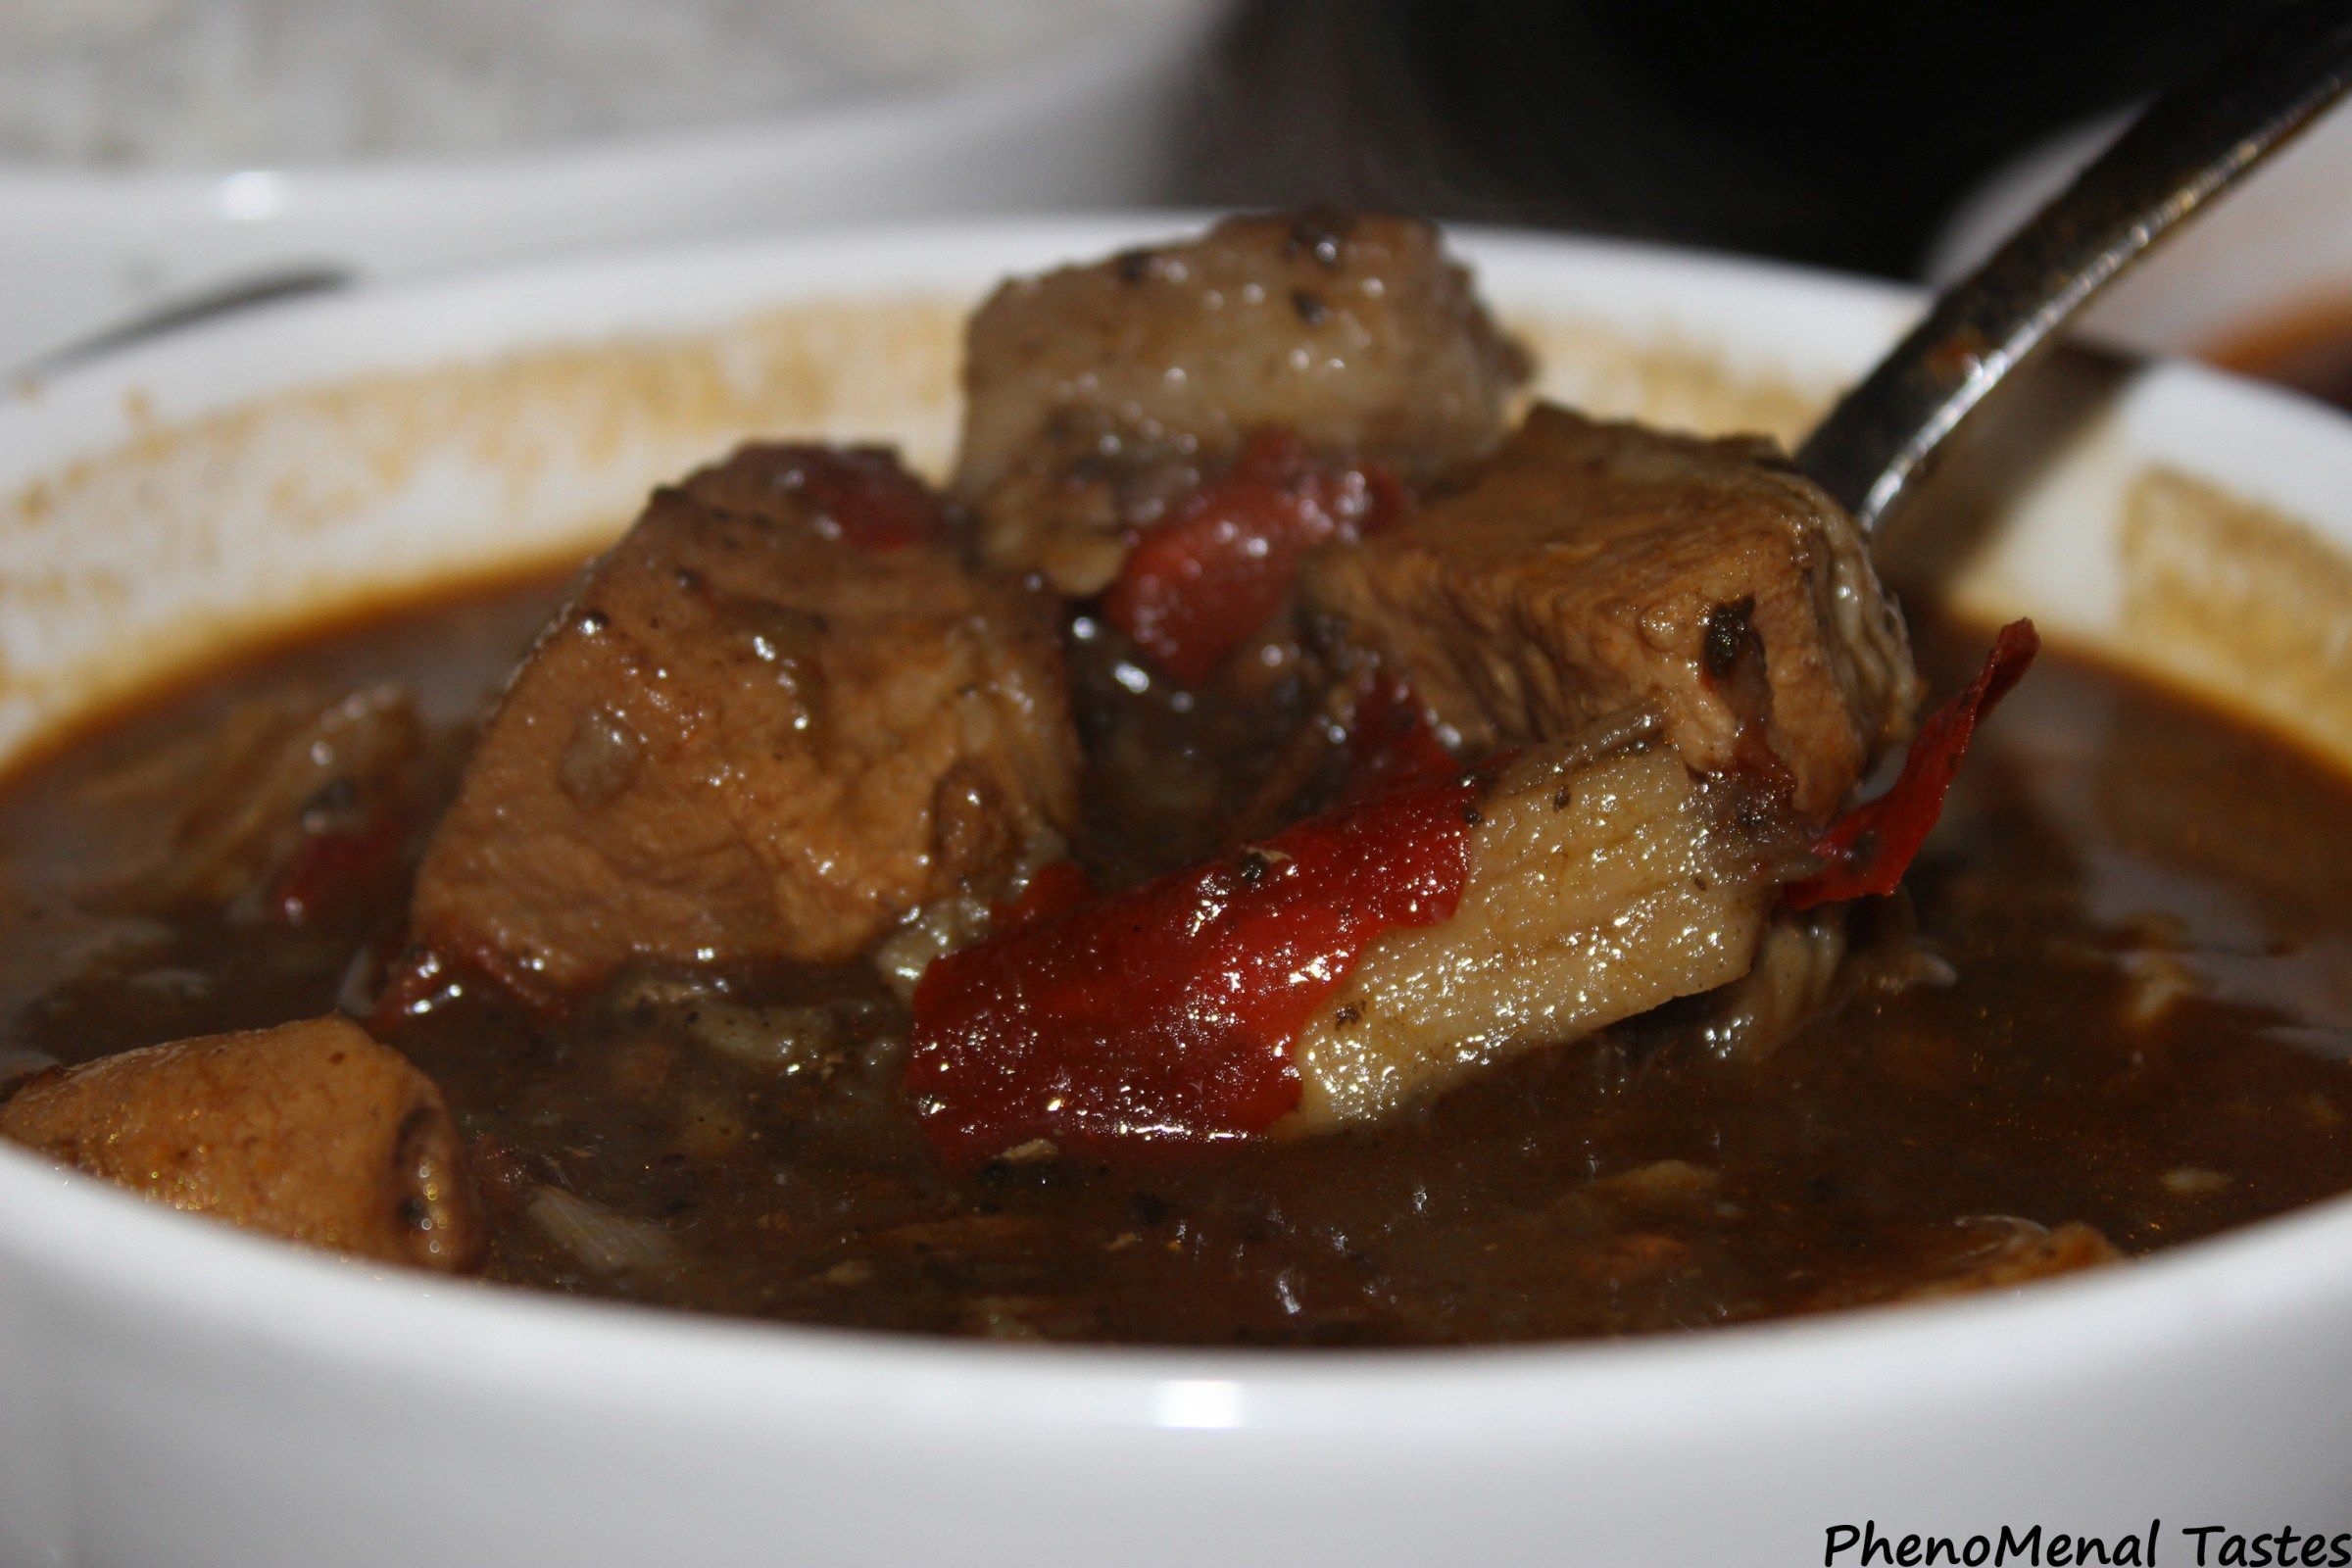 Phenomenon praveenpravs phenomenal tastes pork with anishi nagamese phenomenon praveenpravs phenomenal tastes pork with anishi nagamese forumfinder Choice Image